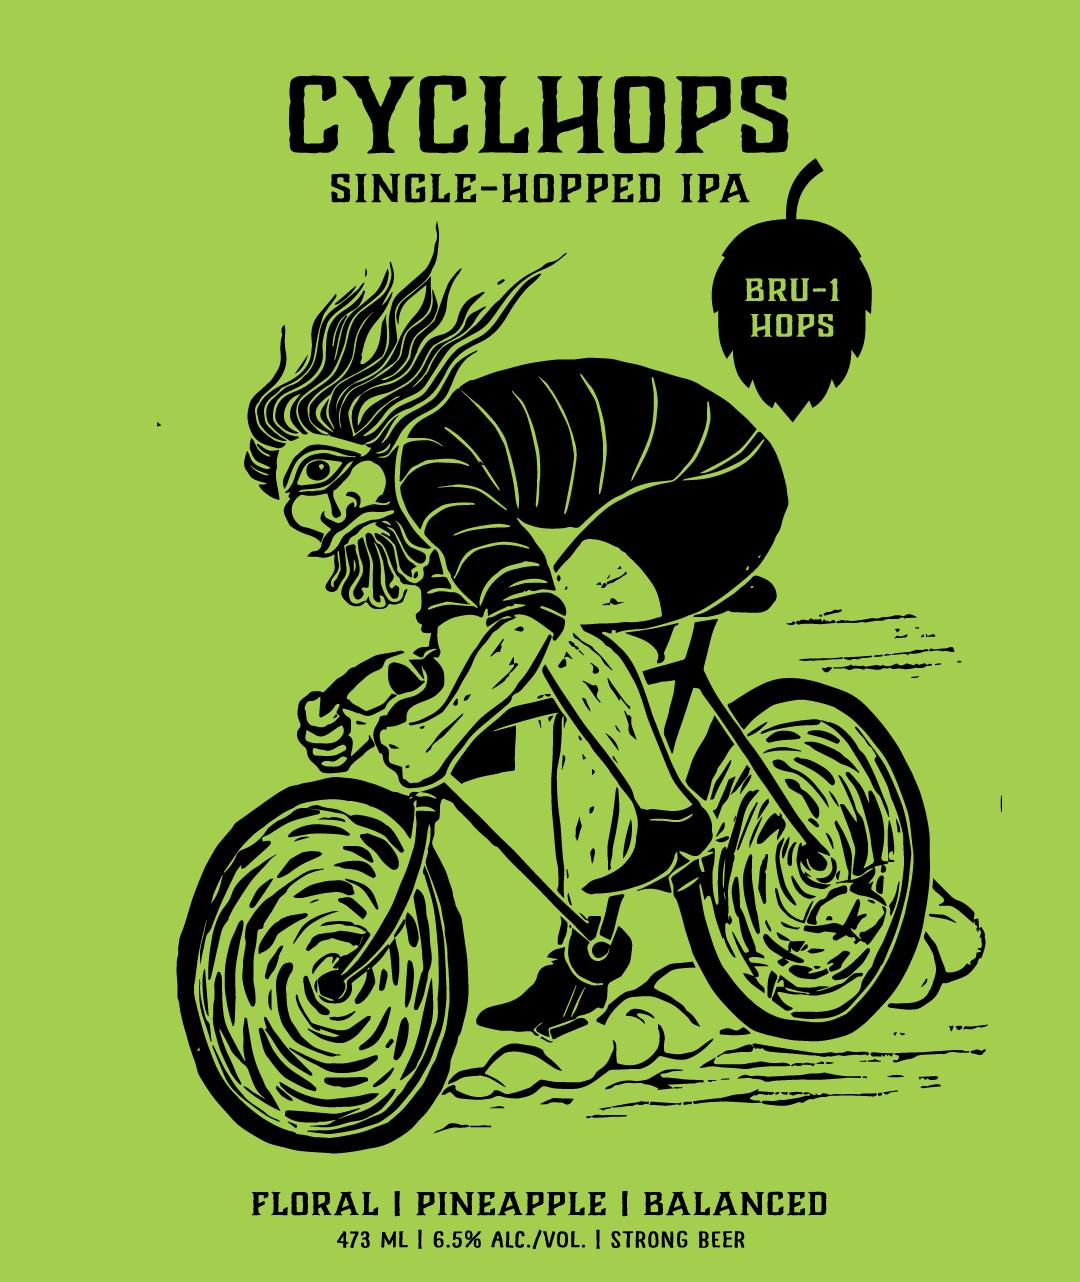 CYCLHOPS (BRU-1)